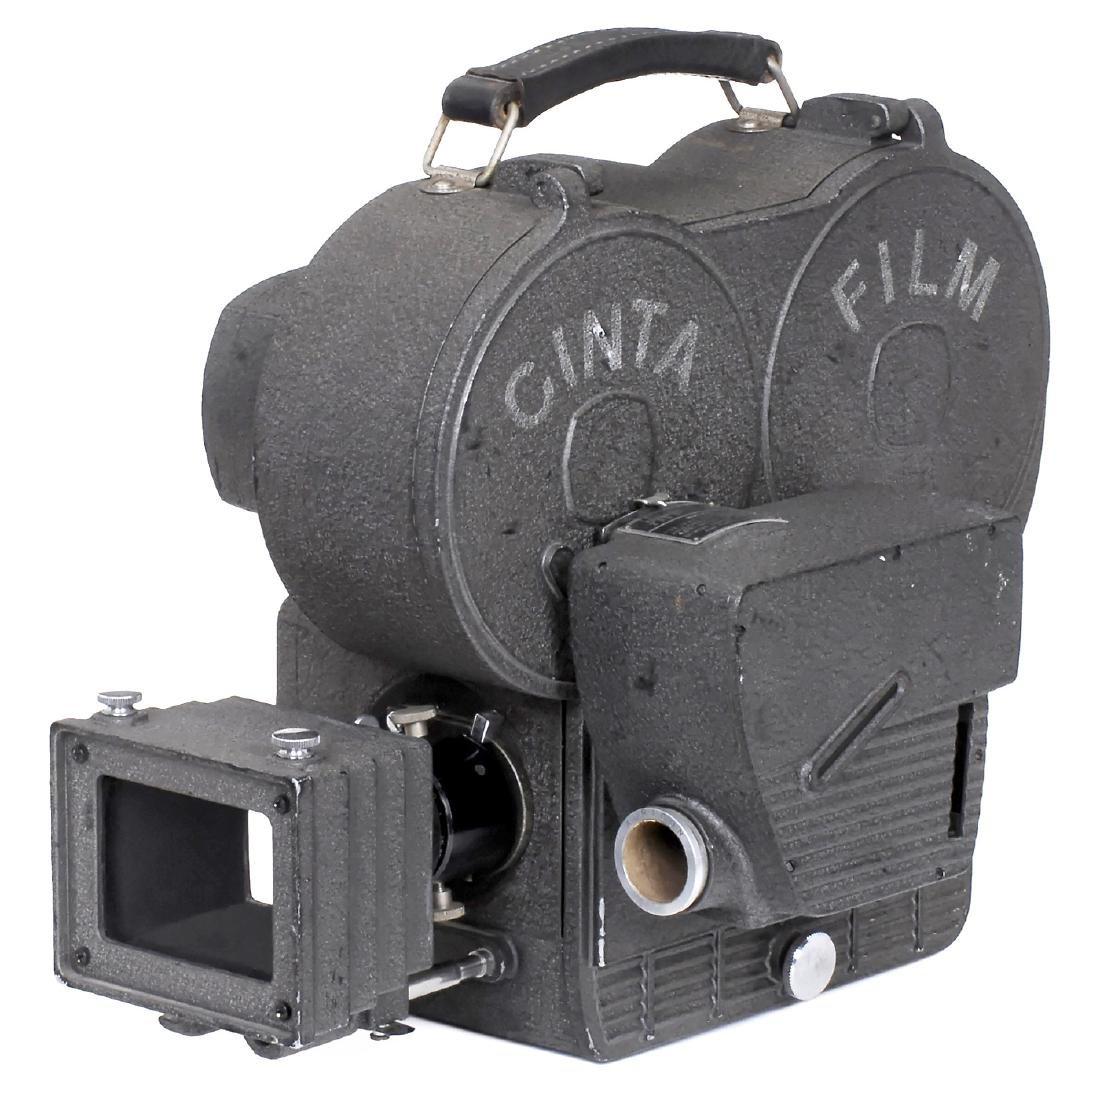 Auricon CM-71 16mm Movie Camera, c. 1955